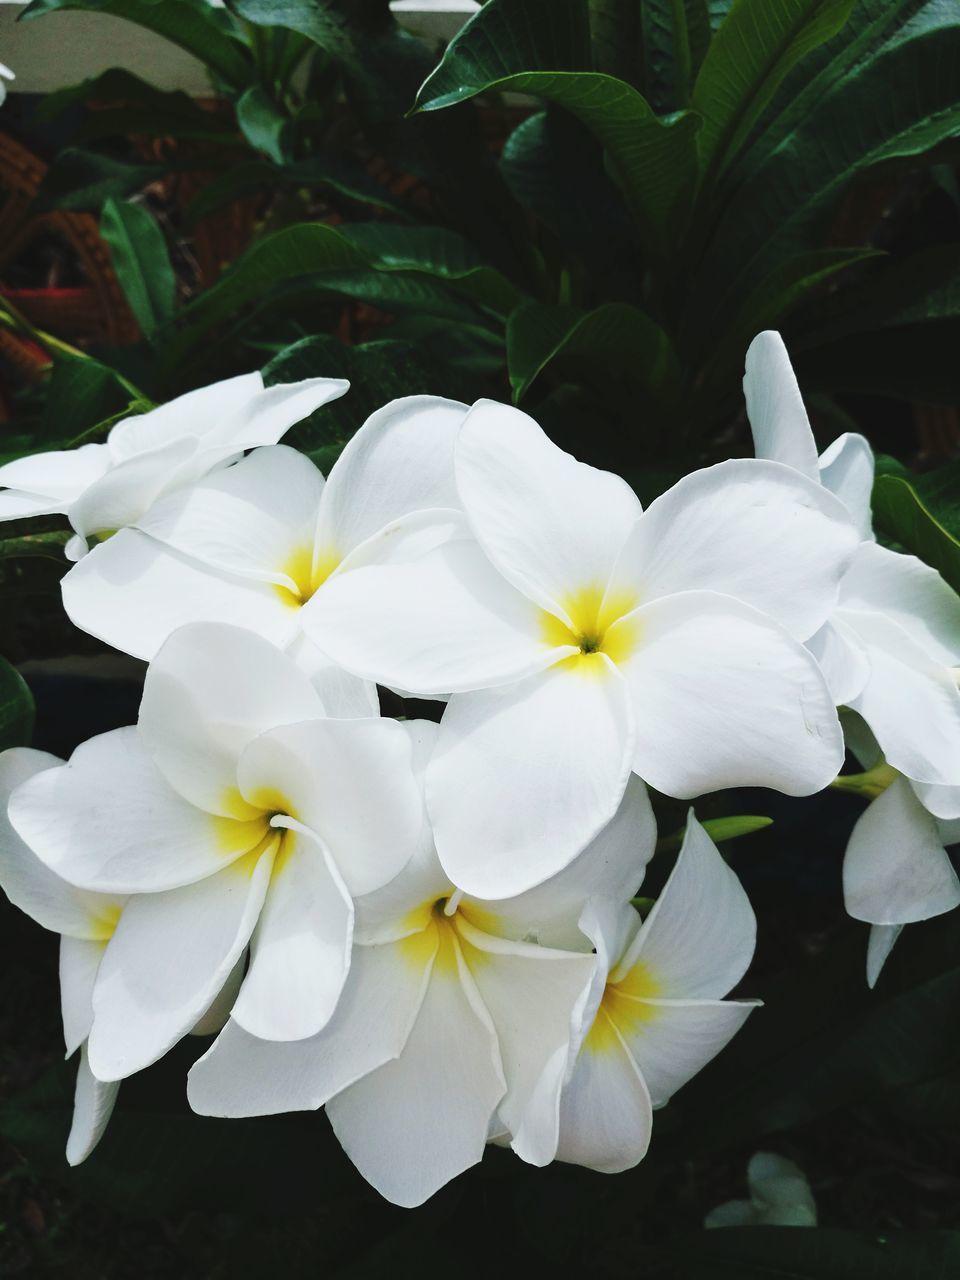 CLOSE-UP OF WHITE FRANGIPANI FLOWERS